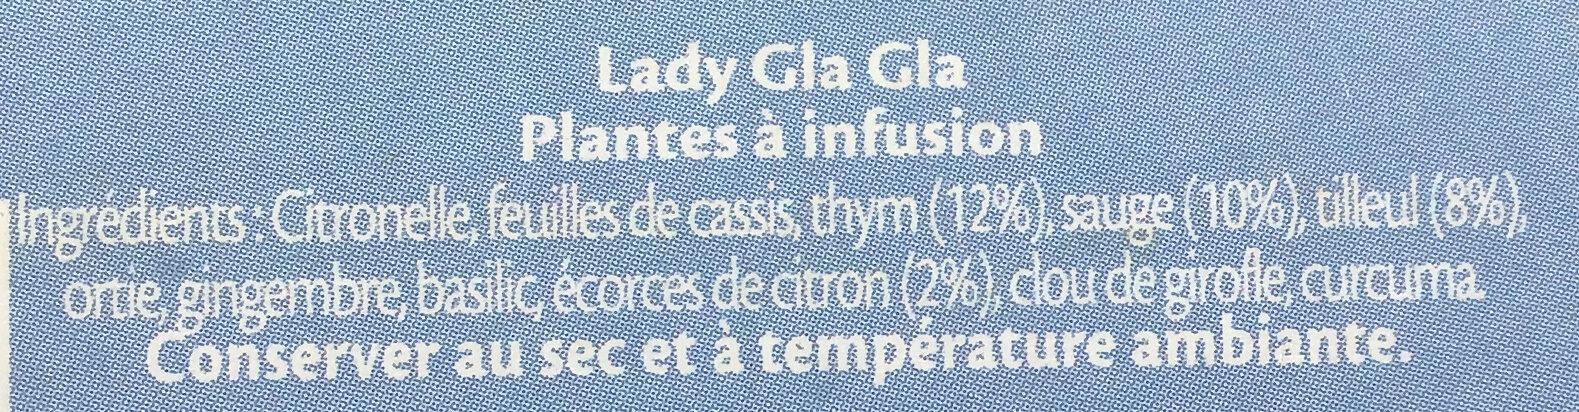 Elephant Infusion Lady Gla Gla 25 Sachets - Ingredients - fr